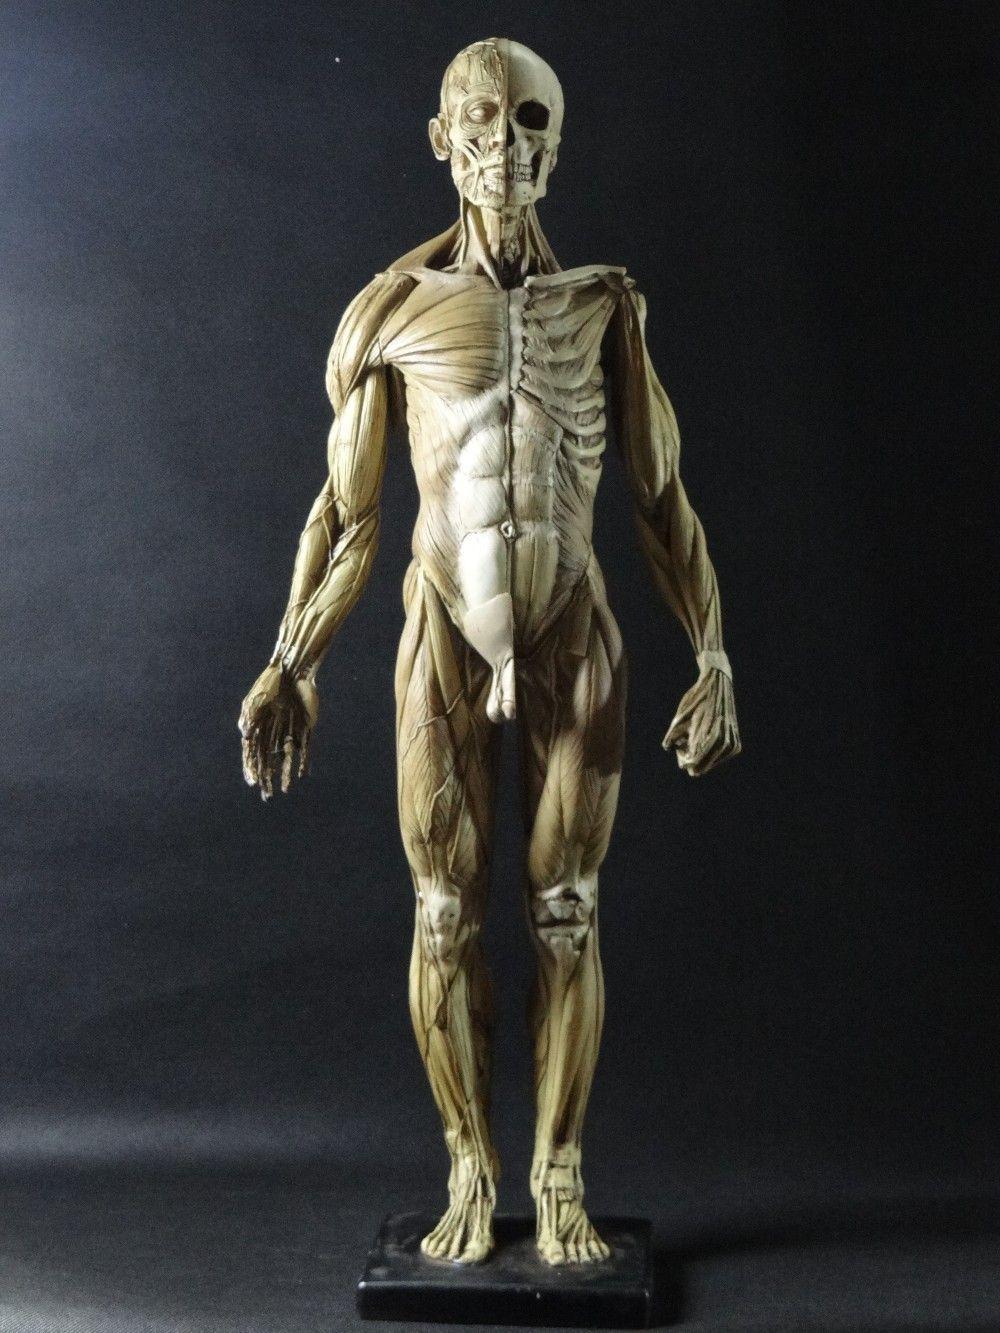 45cm Model Emulation Resin Muscular Human Anatomy Model For Art And